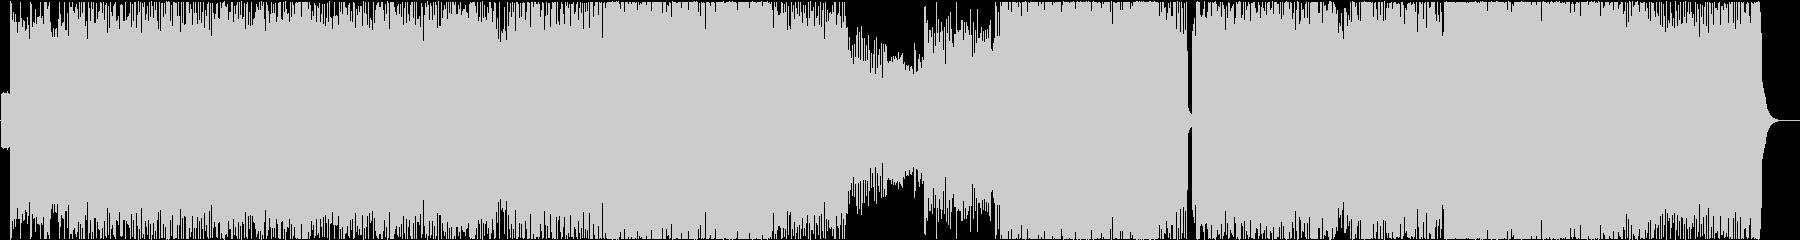 Sticky Menhela Song's unreproduced waveform